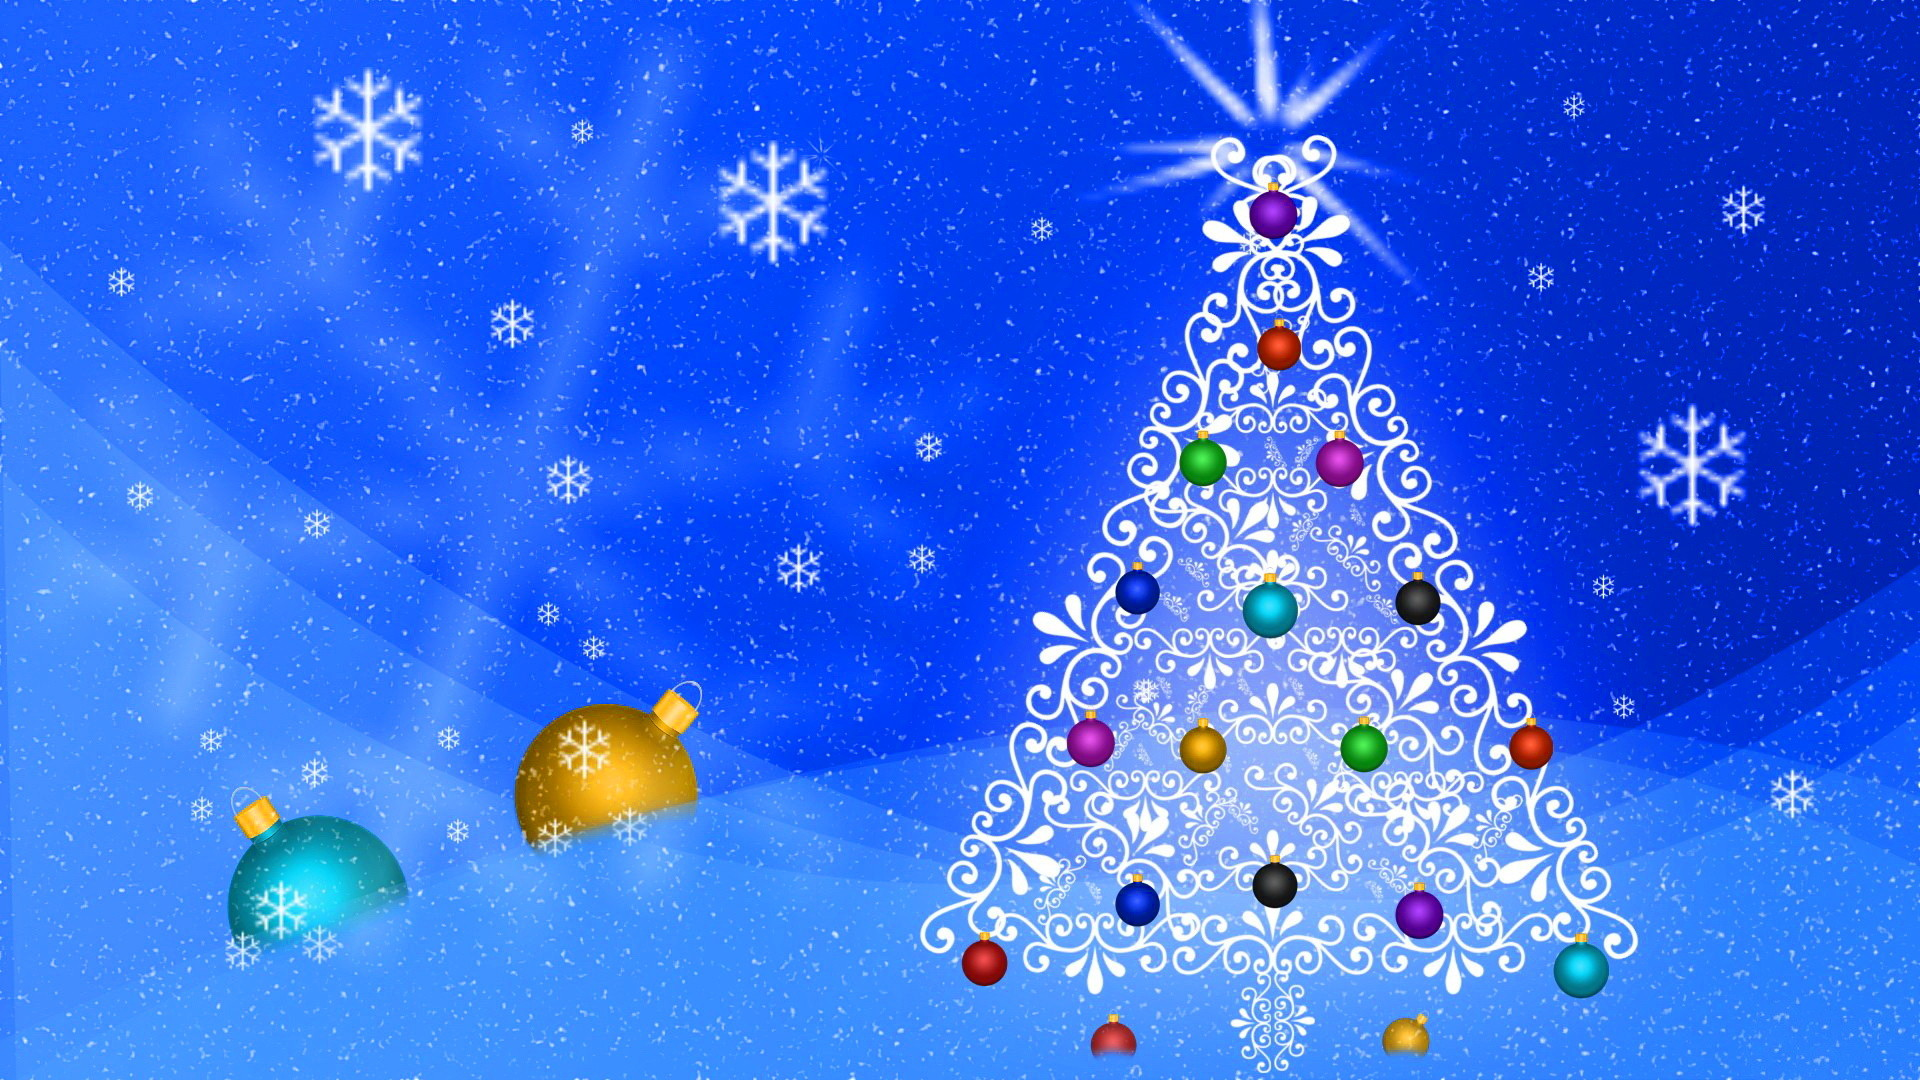 Cute Christmas Desktop Backgrounds (63+ images)